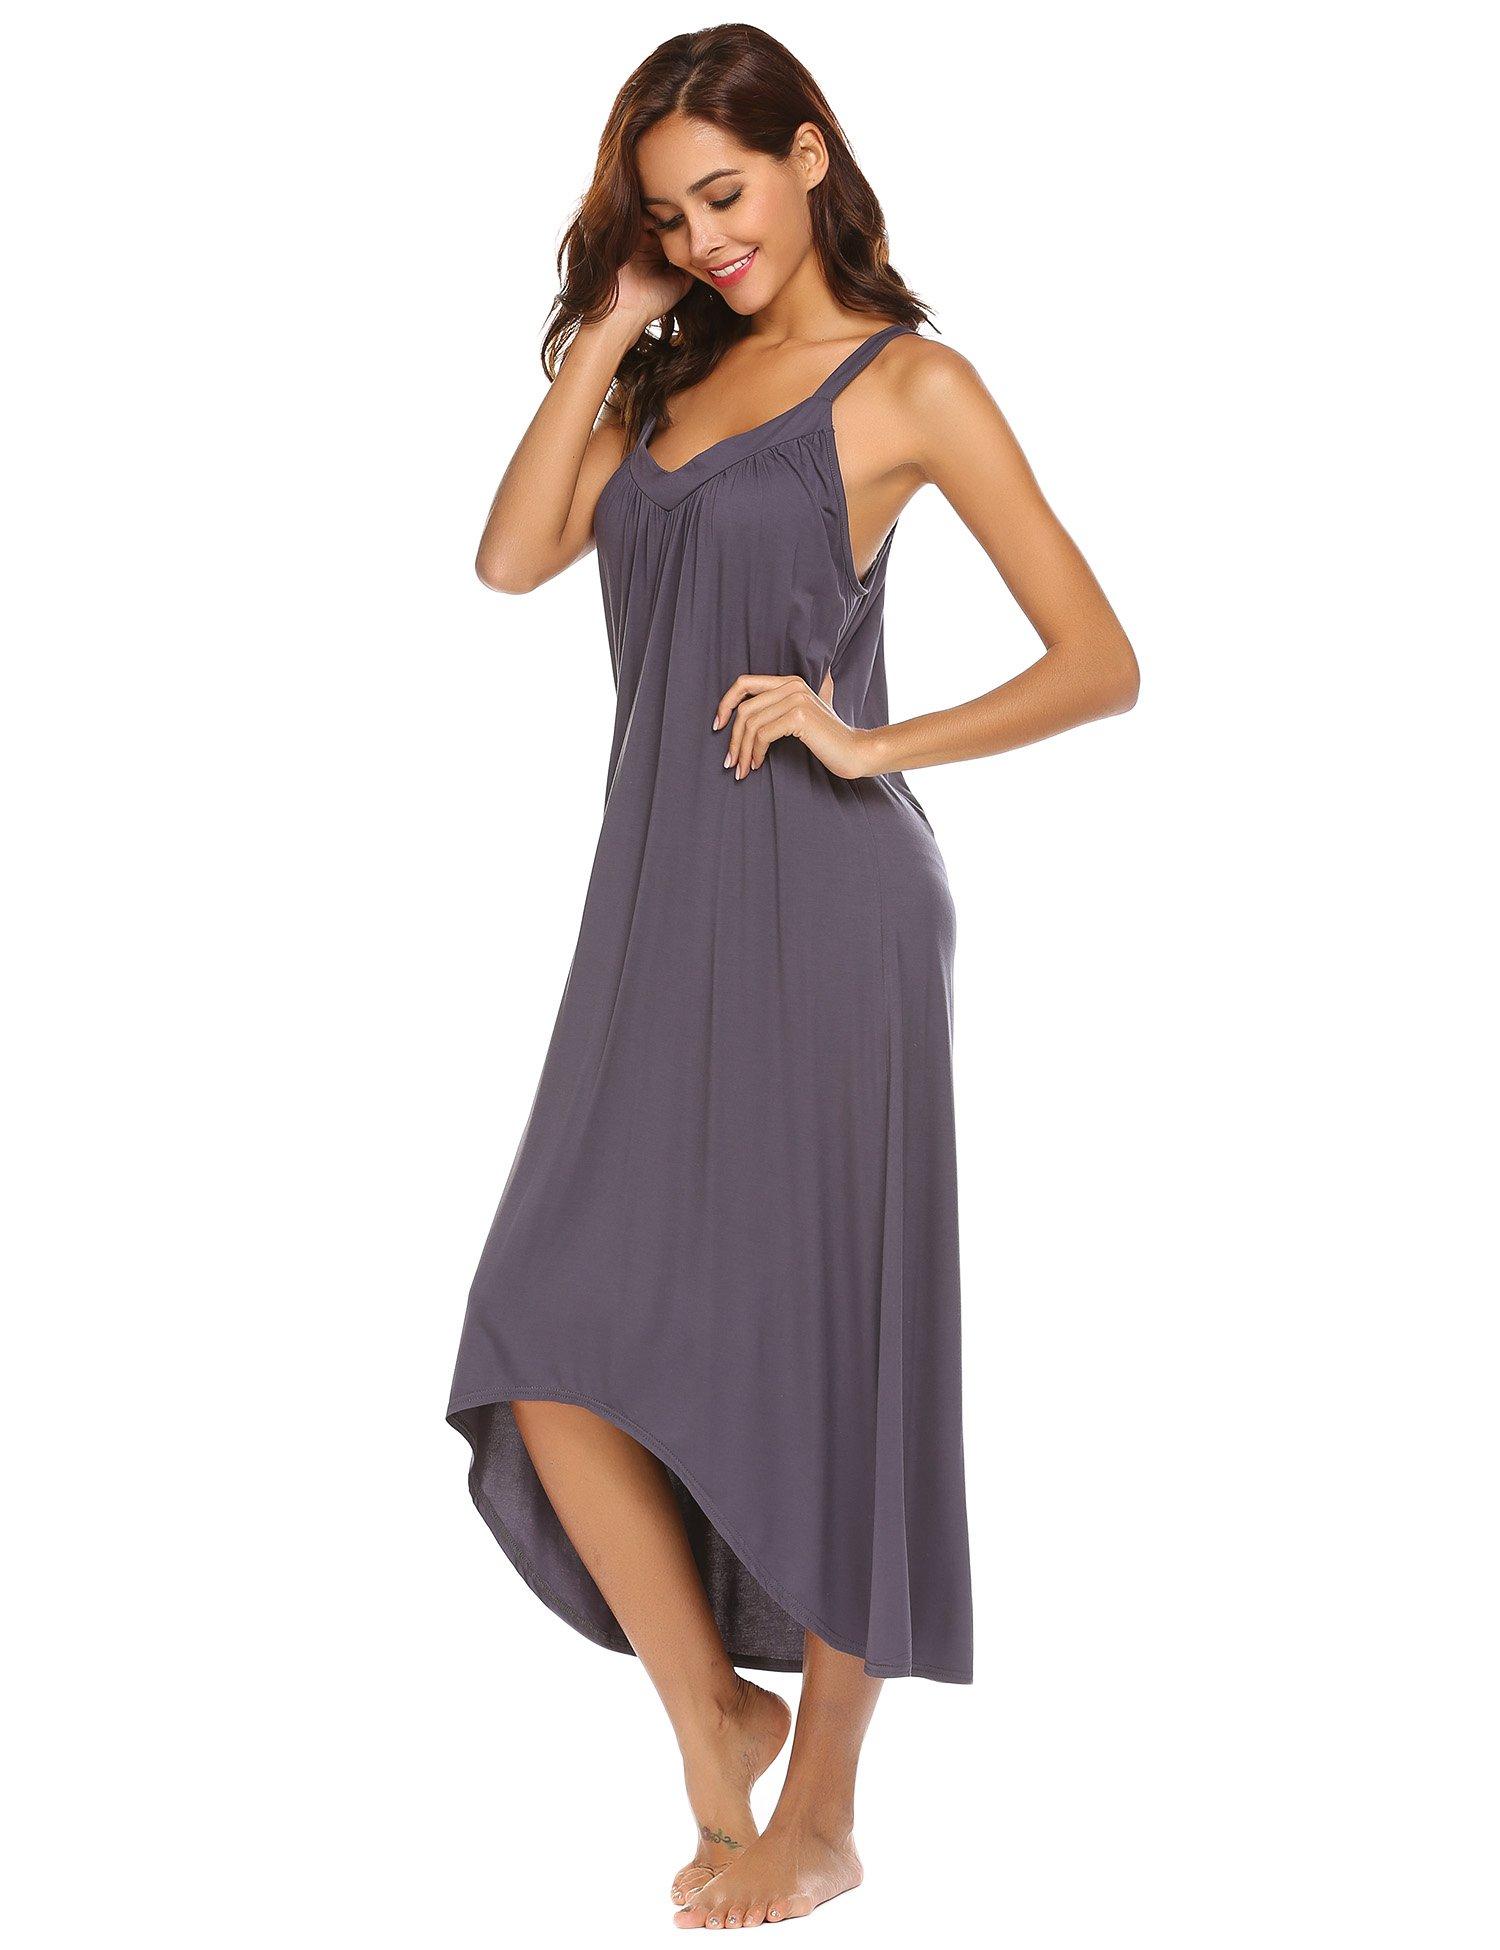 Ekouaer Womens Sleeveless Long Nightgown Summer Slip Night Dress Cotton Sleepshirt Chemise,A-dark Grey_6696,Small by Ekouaer (Image #4)